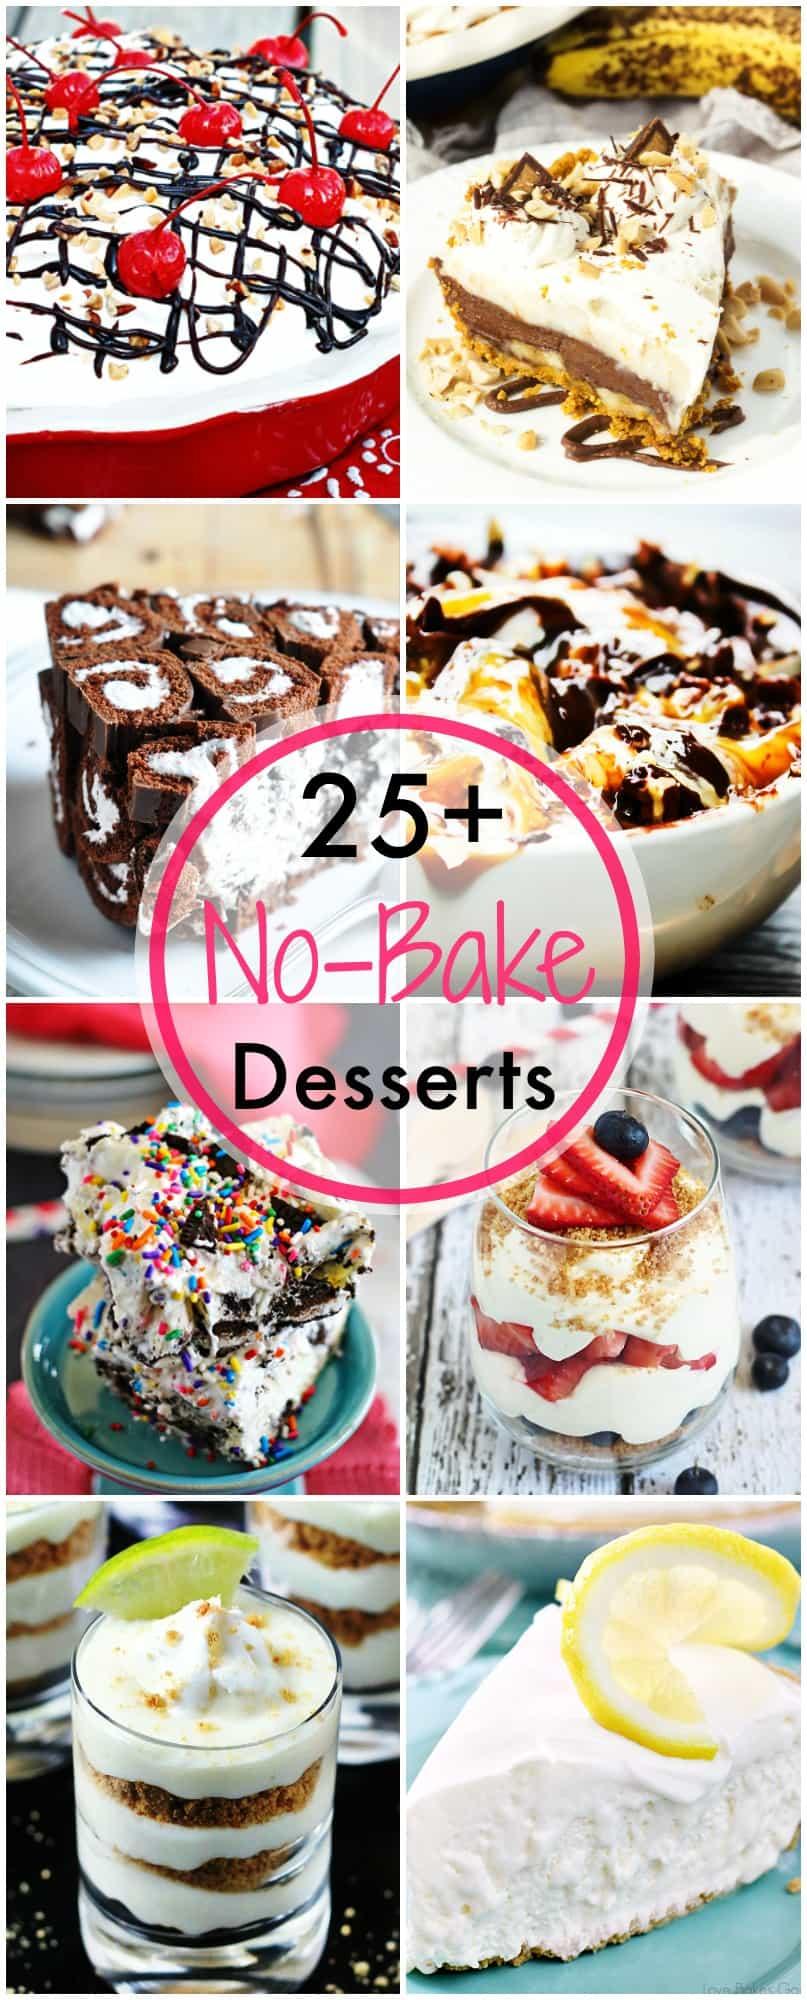 More Than 25 No-Bake Desserts